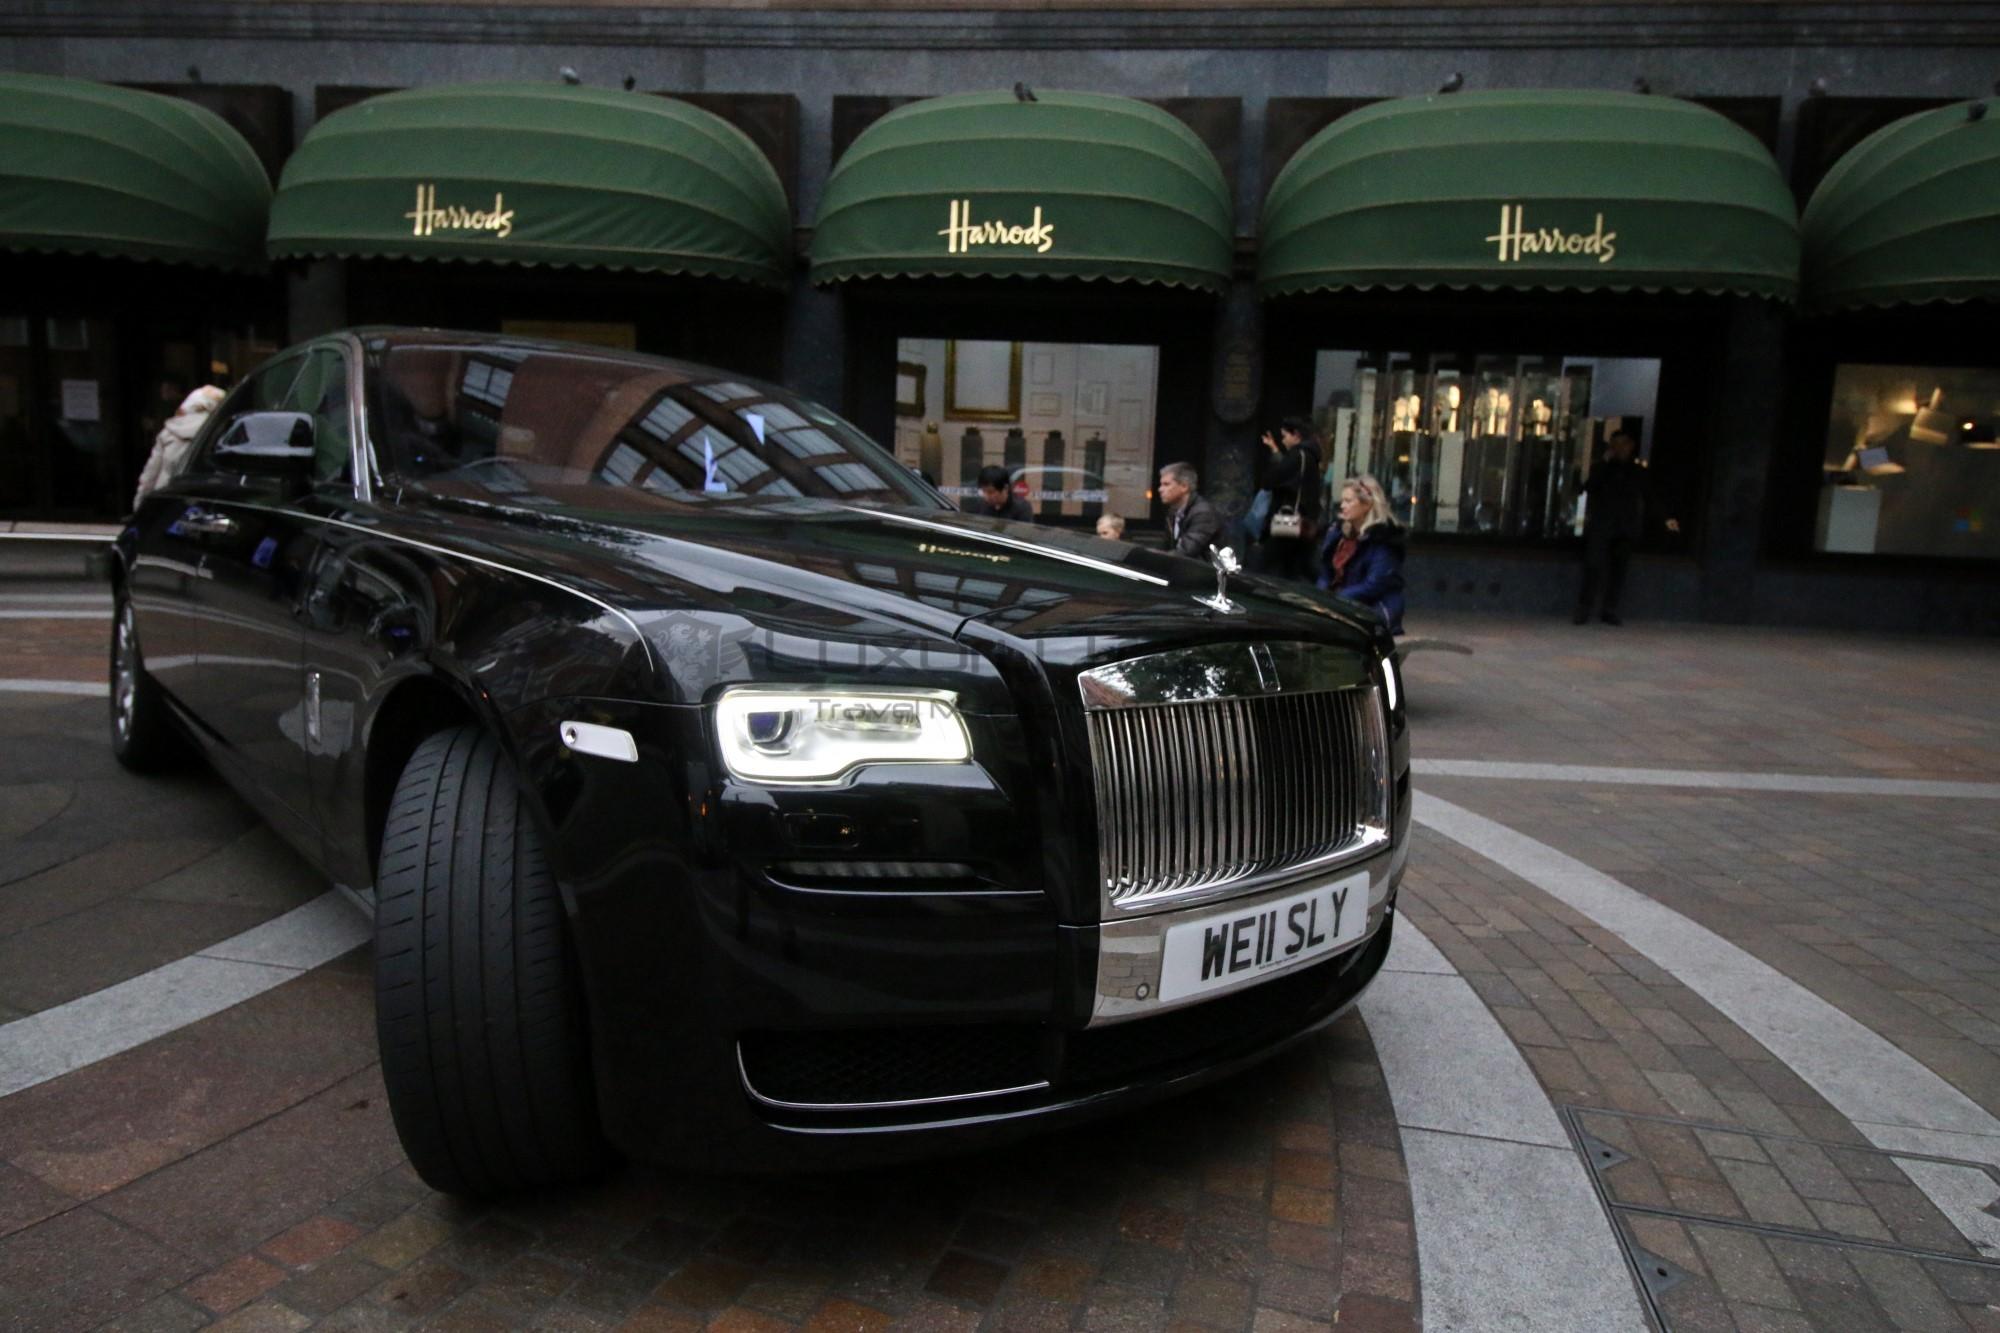 6-wellesley_london_rolls_royce_complimentary